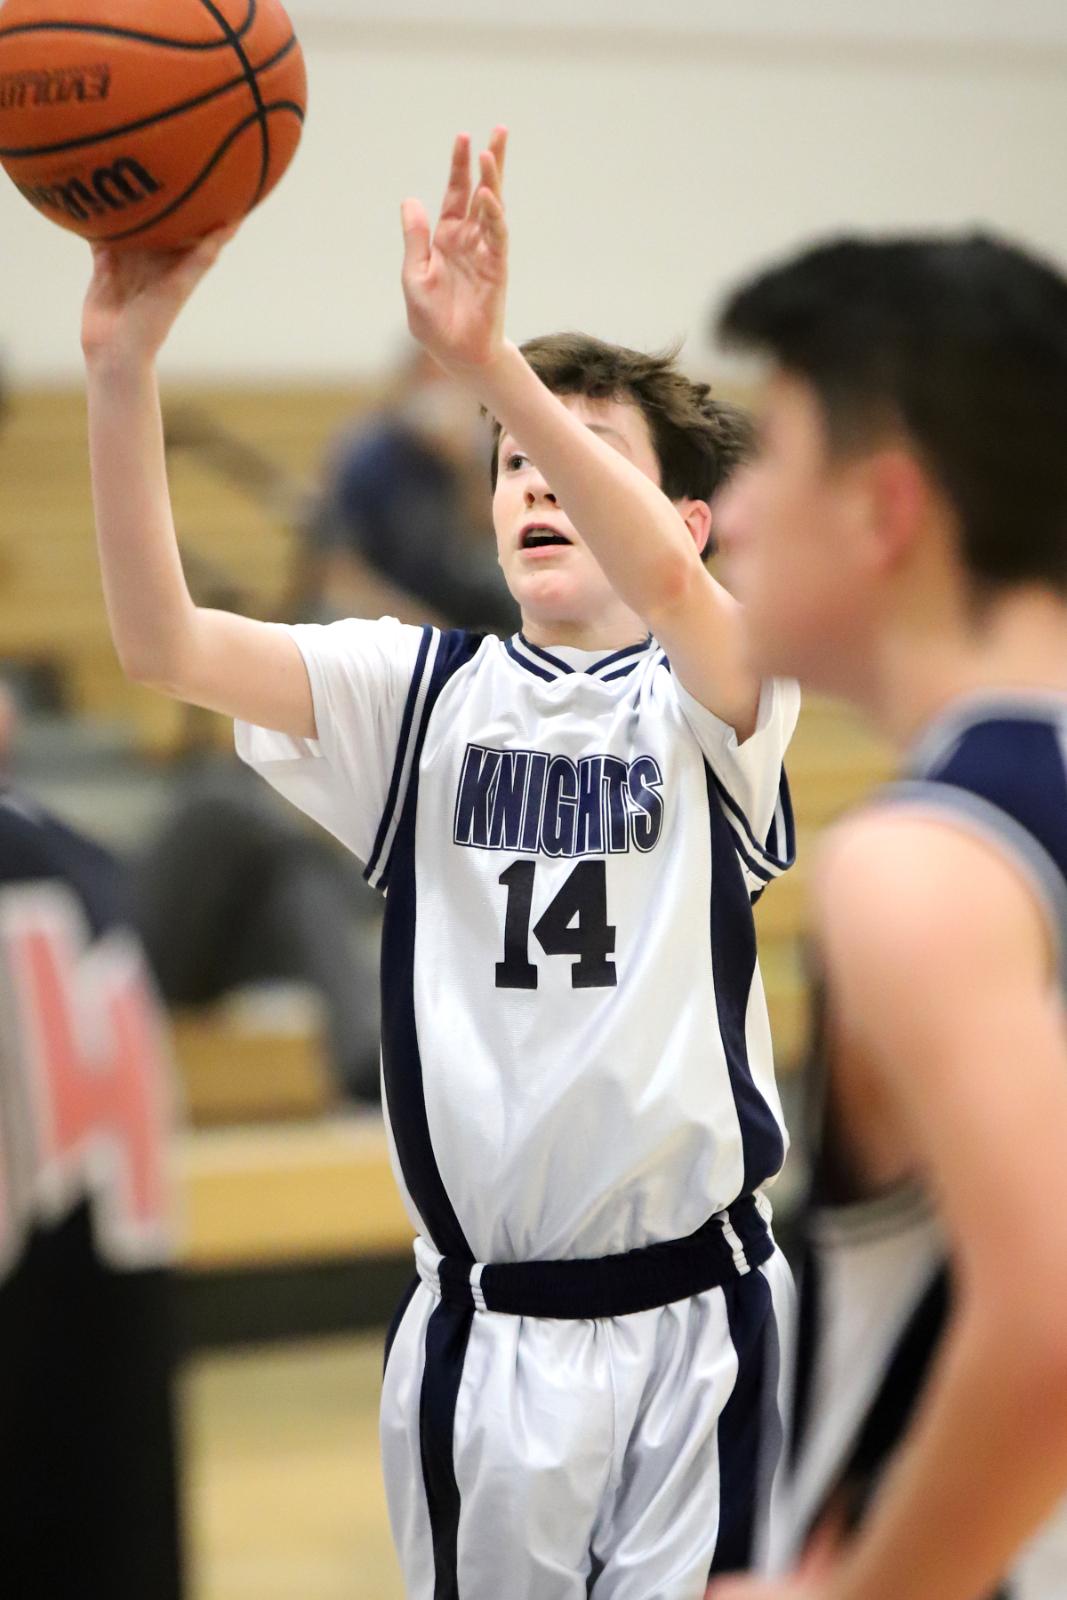 Knights Capture 7th Grade WCJC Championship